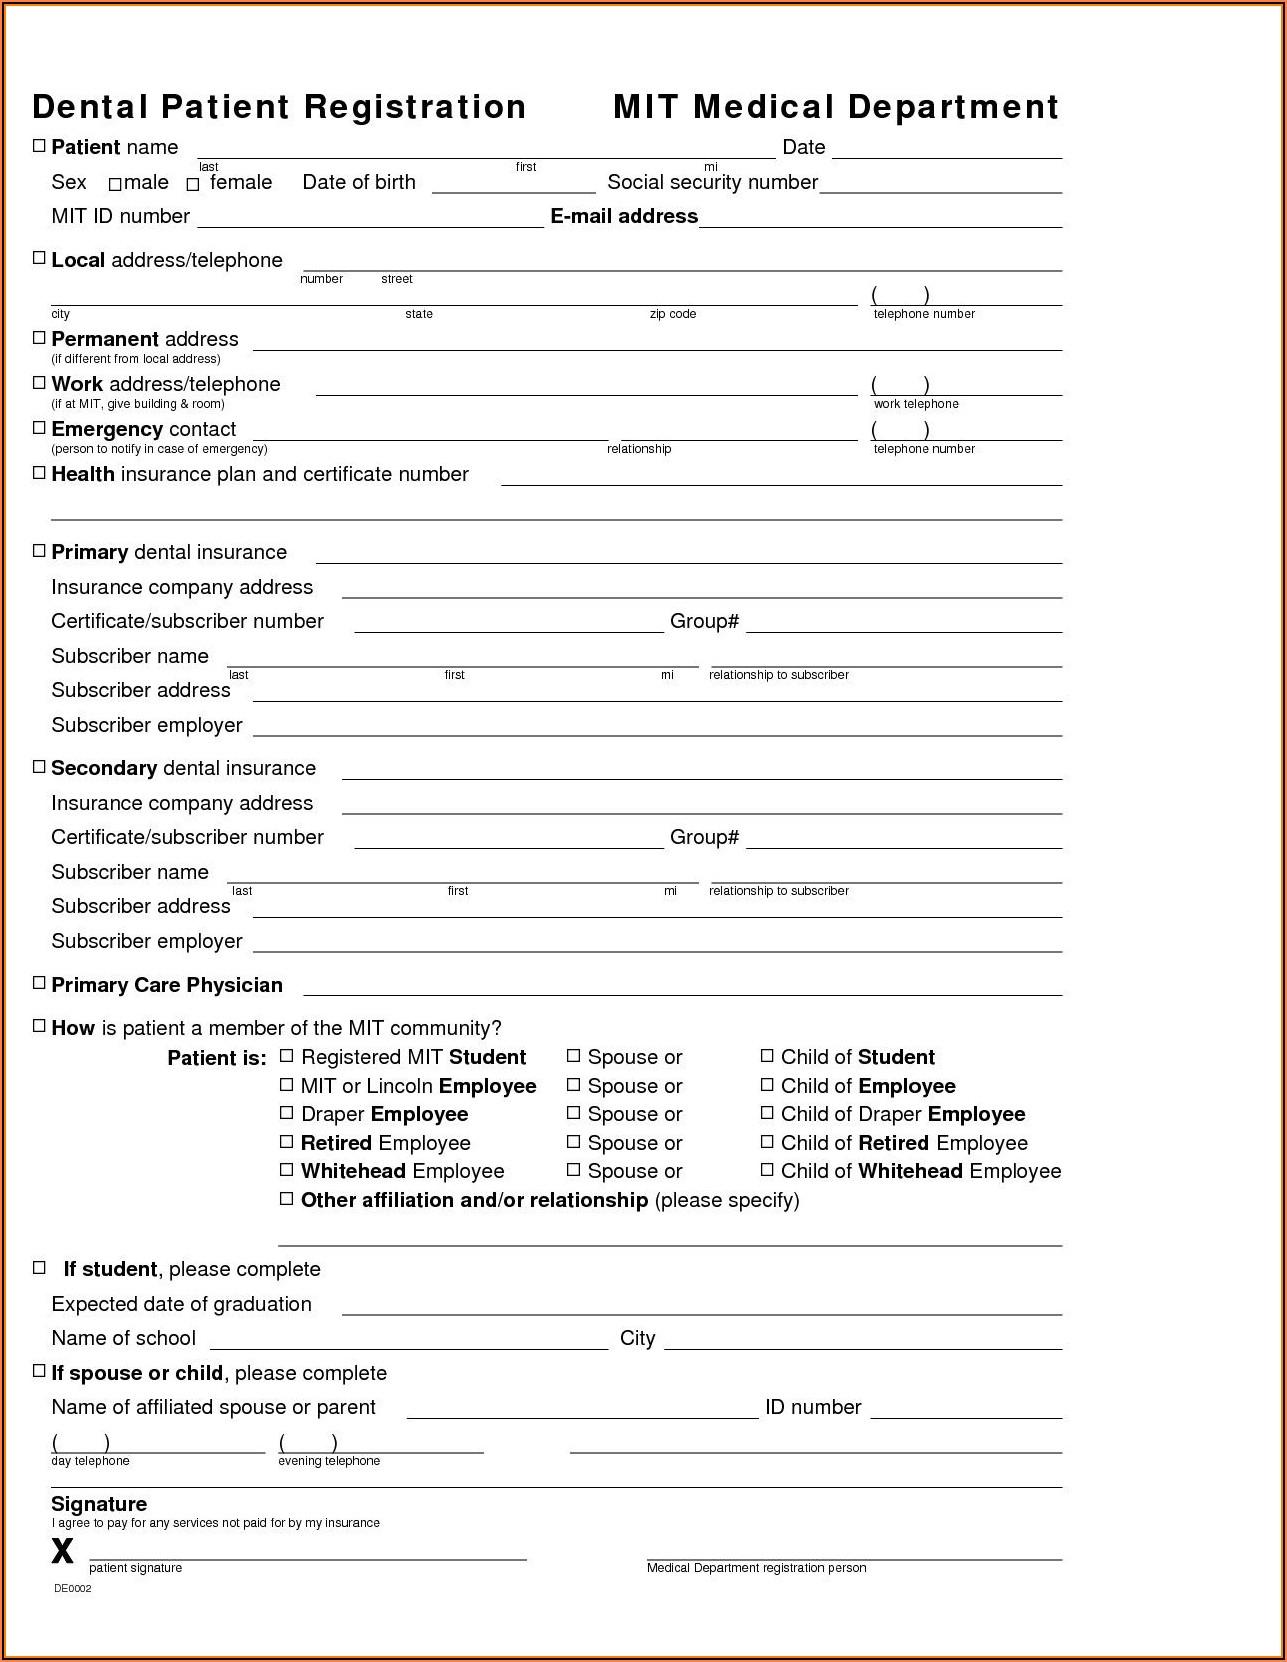 Free Dental Patient Registration Form Template